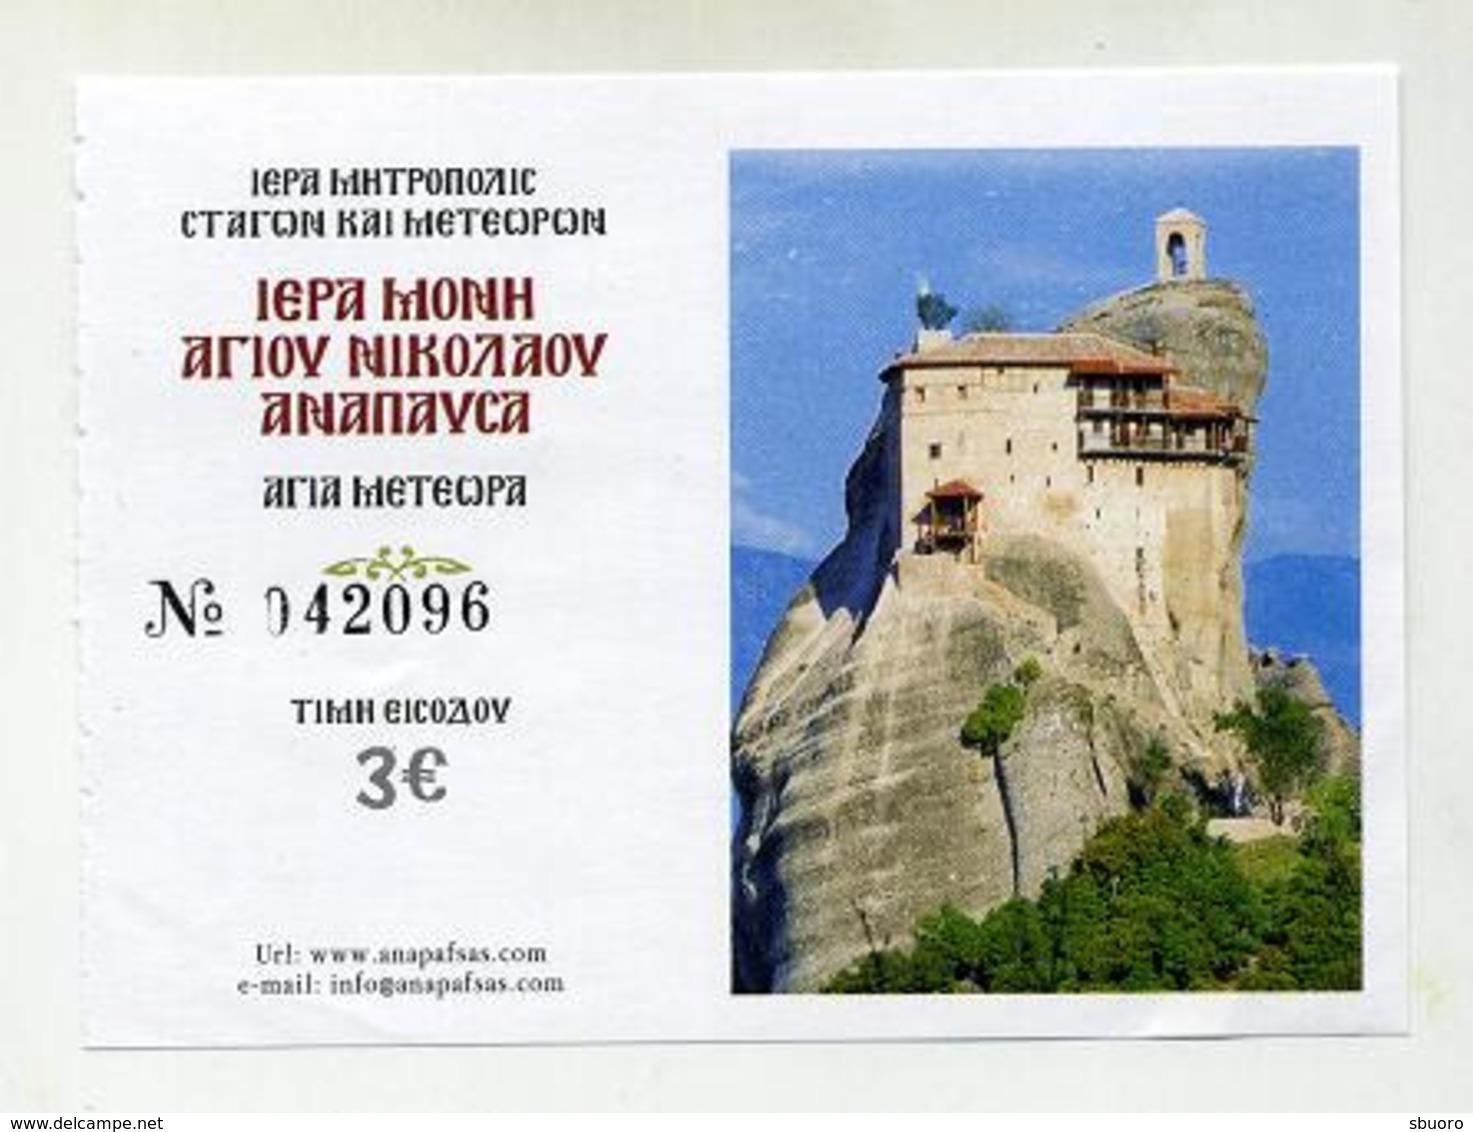 Météores Meteors - Monastère Holy Monastery Saint Nicolas - 2019 - Greece Grèce Griechenland - Tickets - Vouchers